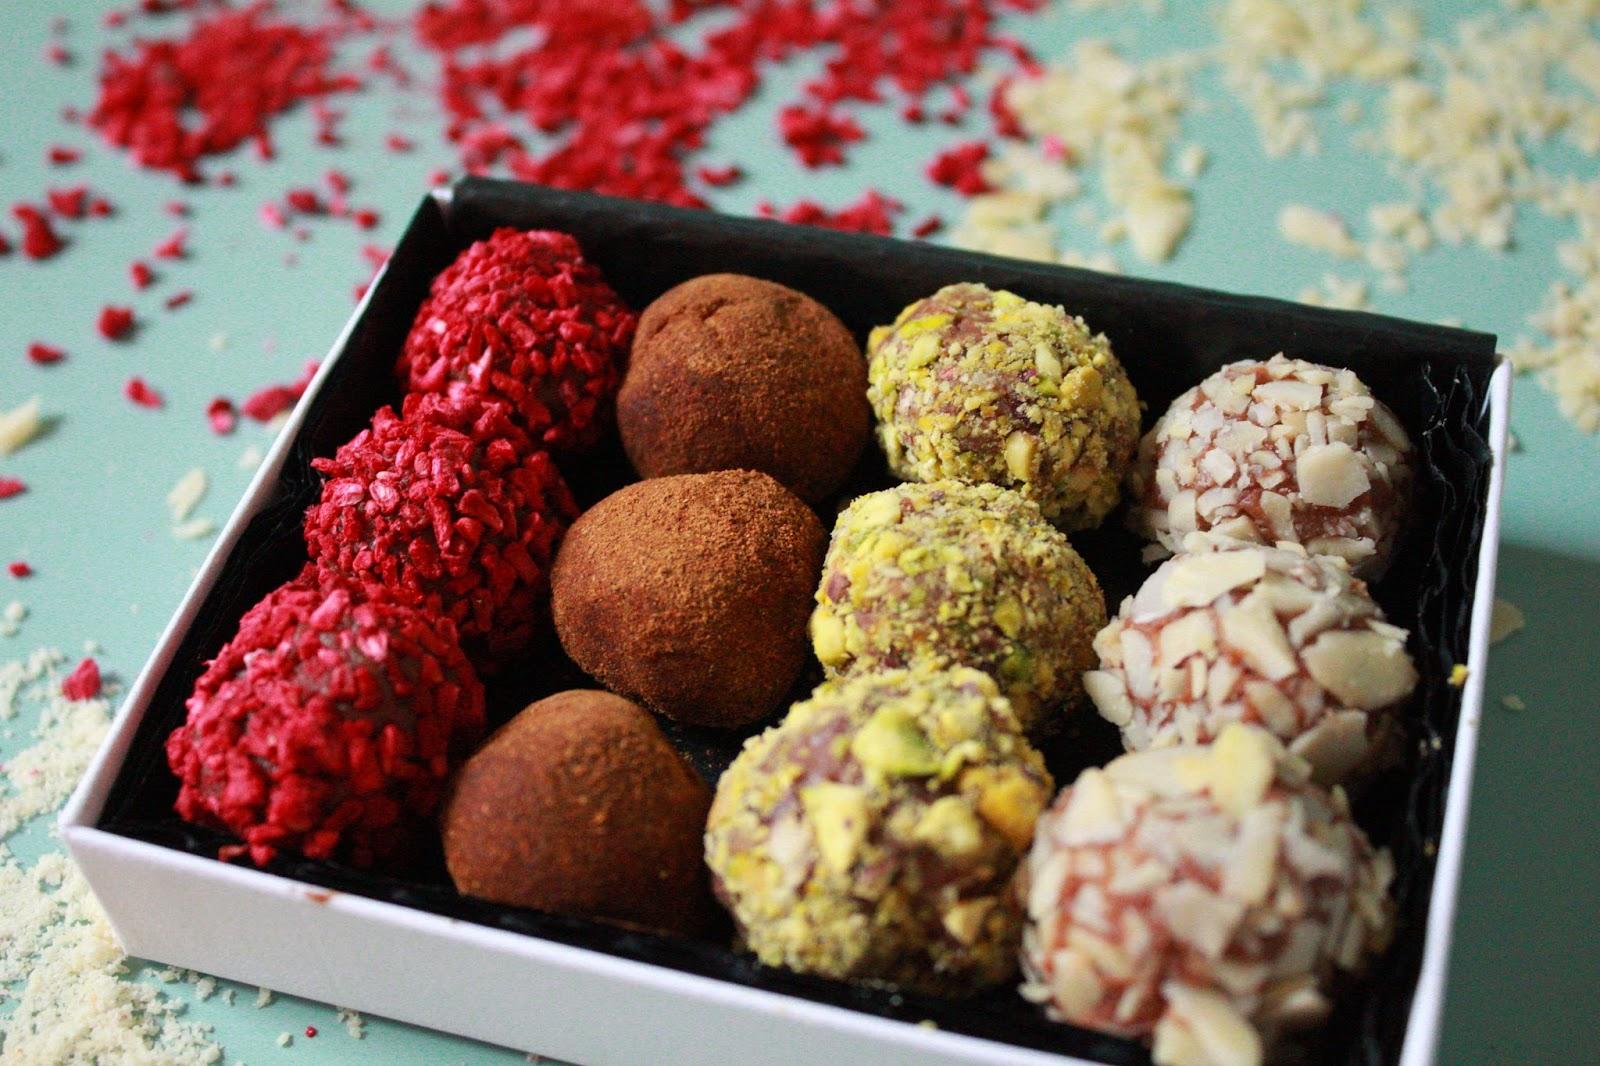 Milk Chocolate Truffle Ideas: Sea Salt, Pistachio, Almond, Cinnamon and Raspberry.